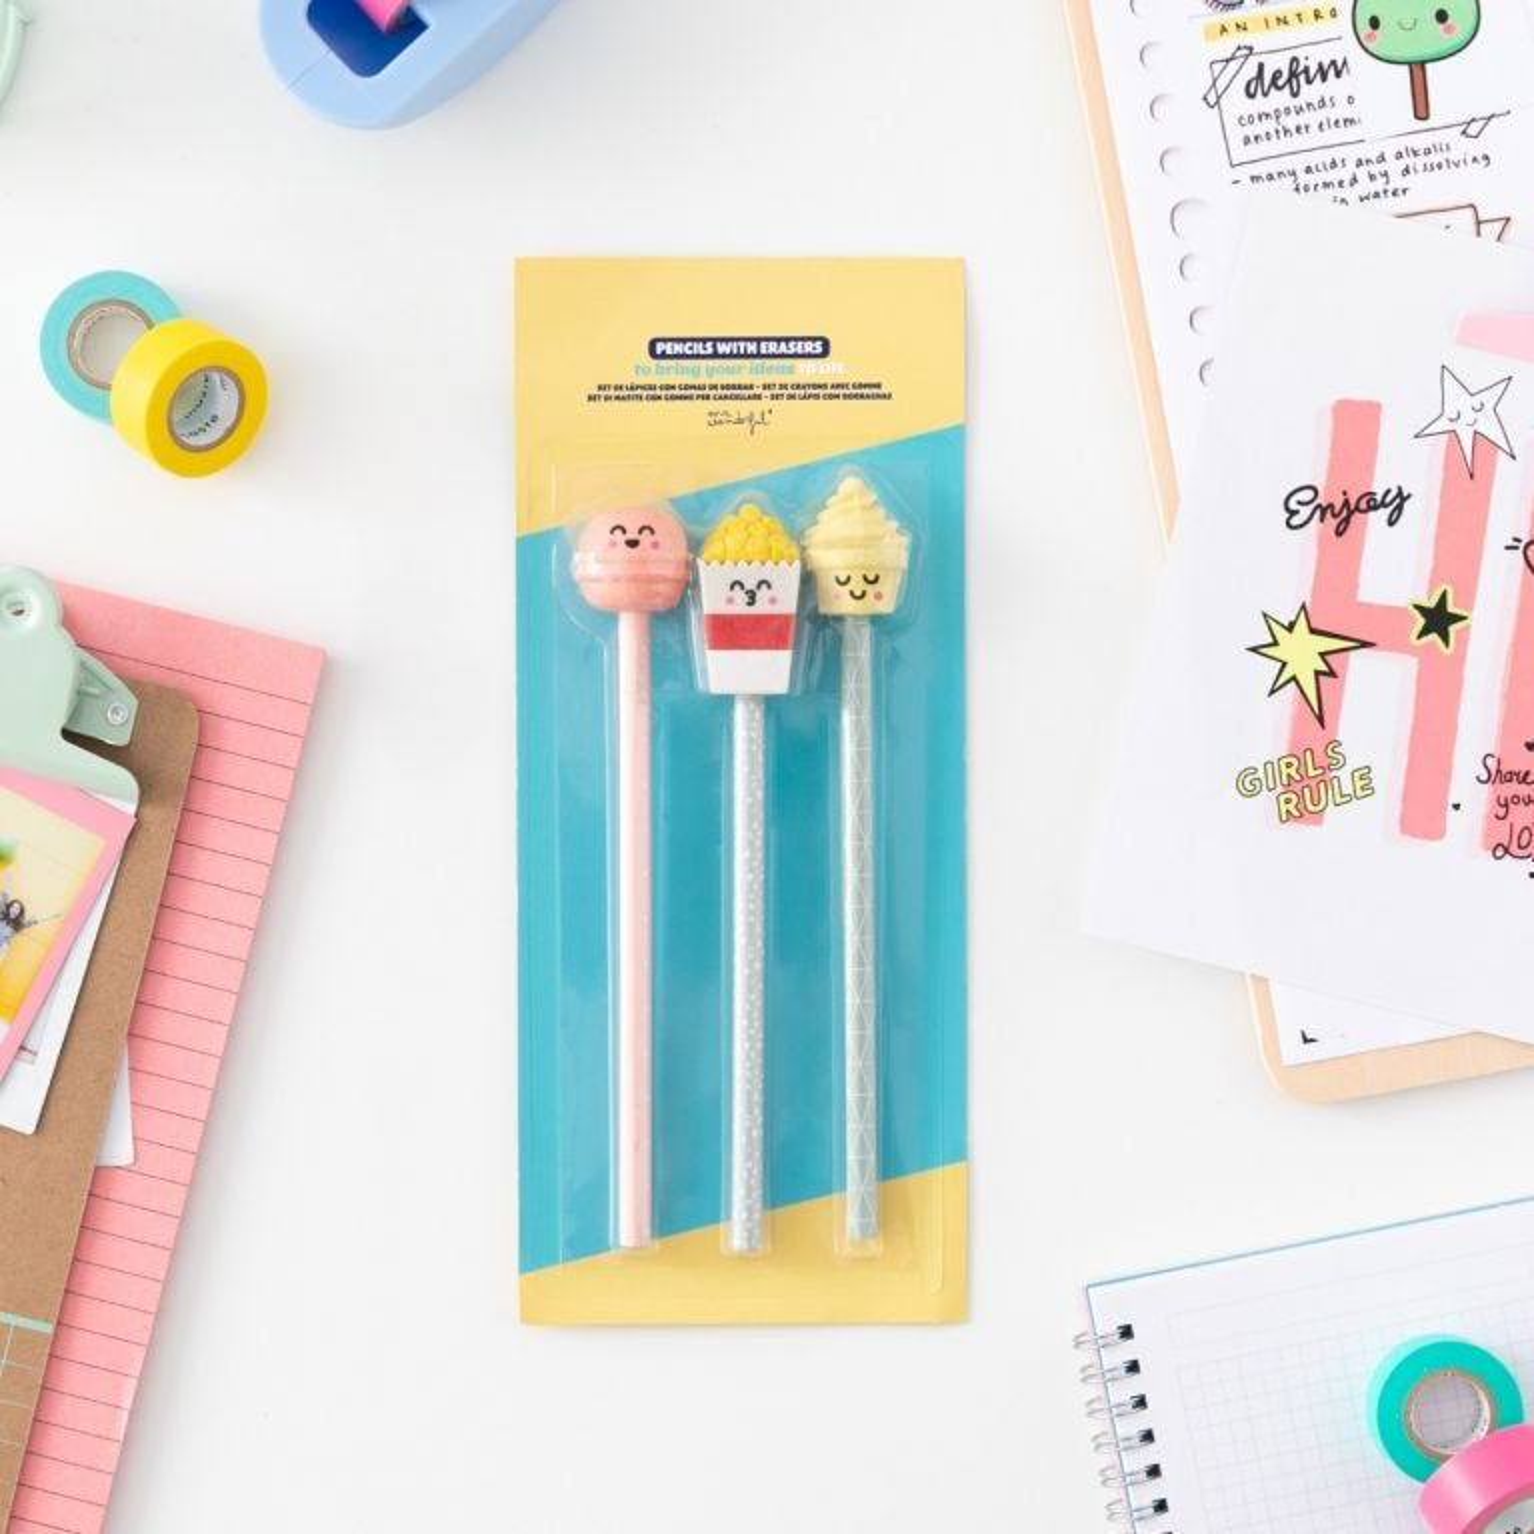 Pencils with erasers - Macaron, popcorn and ice cream